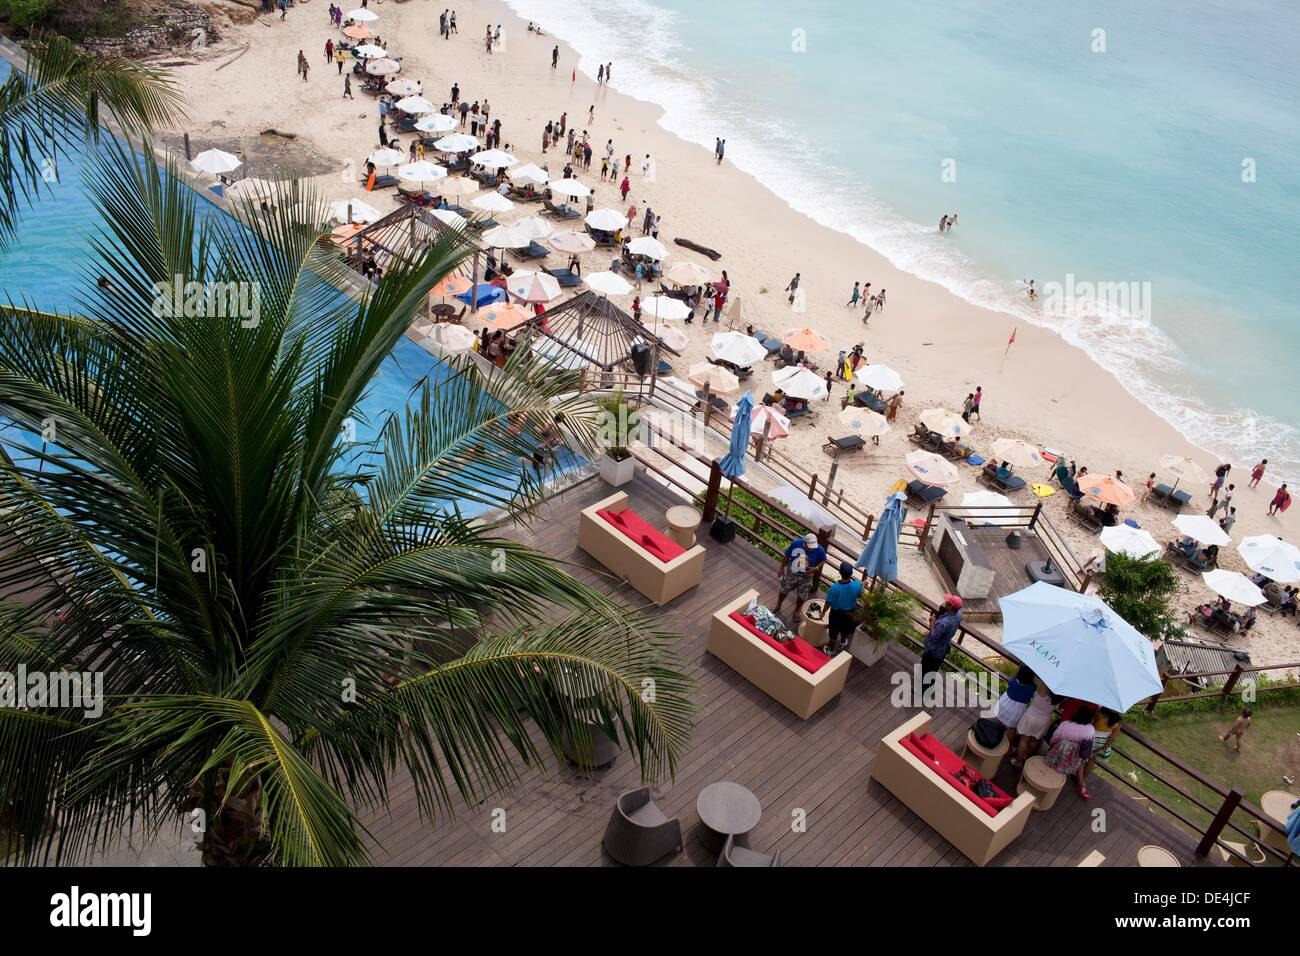 Pecatu Indah Resort Klapa Hotel Bali Stock Photo 60338559 Alamy